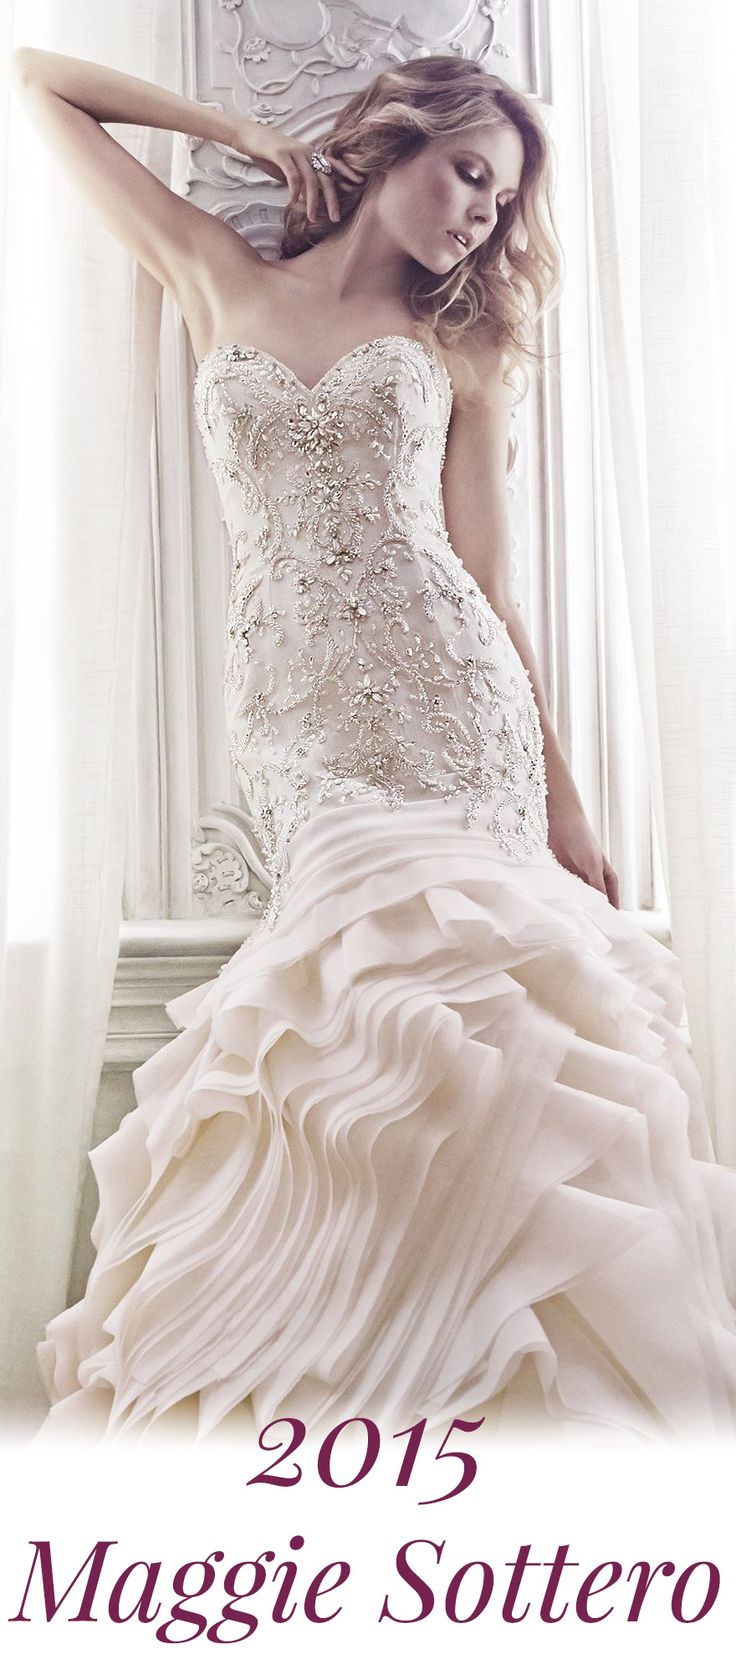 2015 Maggie Sottero Dresses  #thatdressstore Rincon, GA right outside of Savannah!